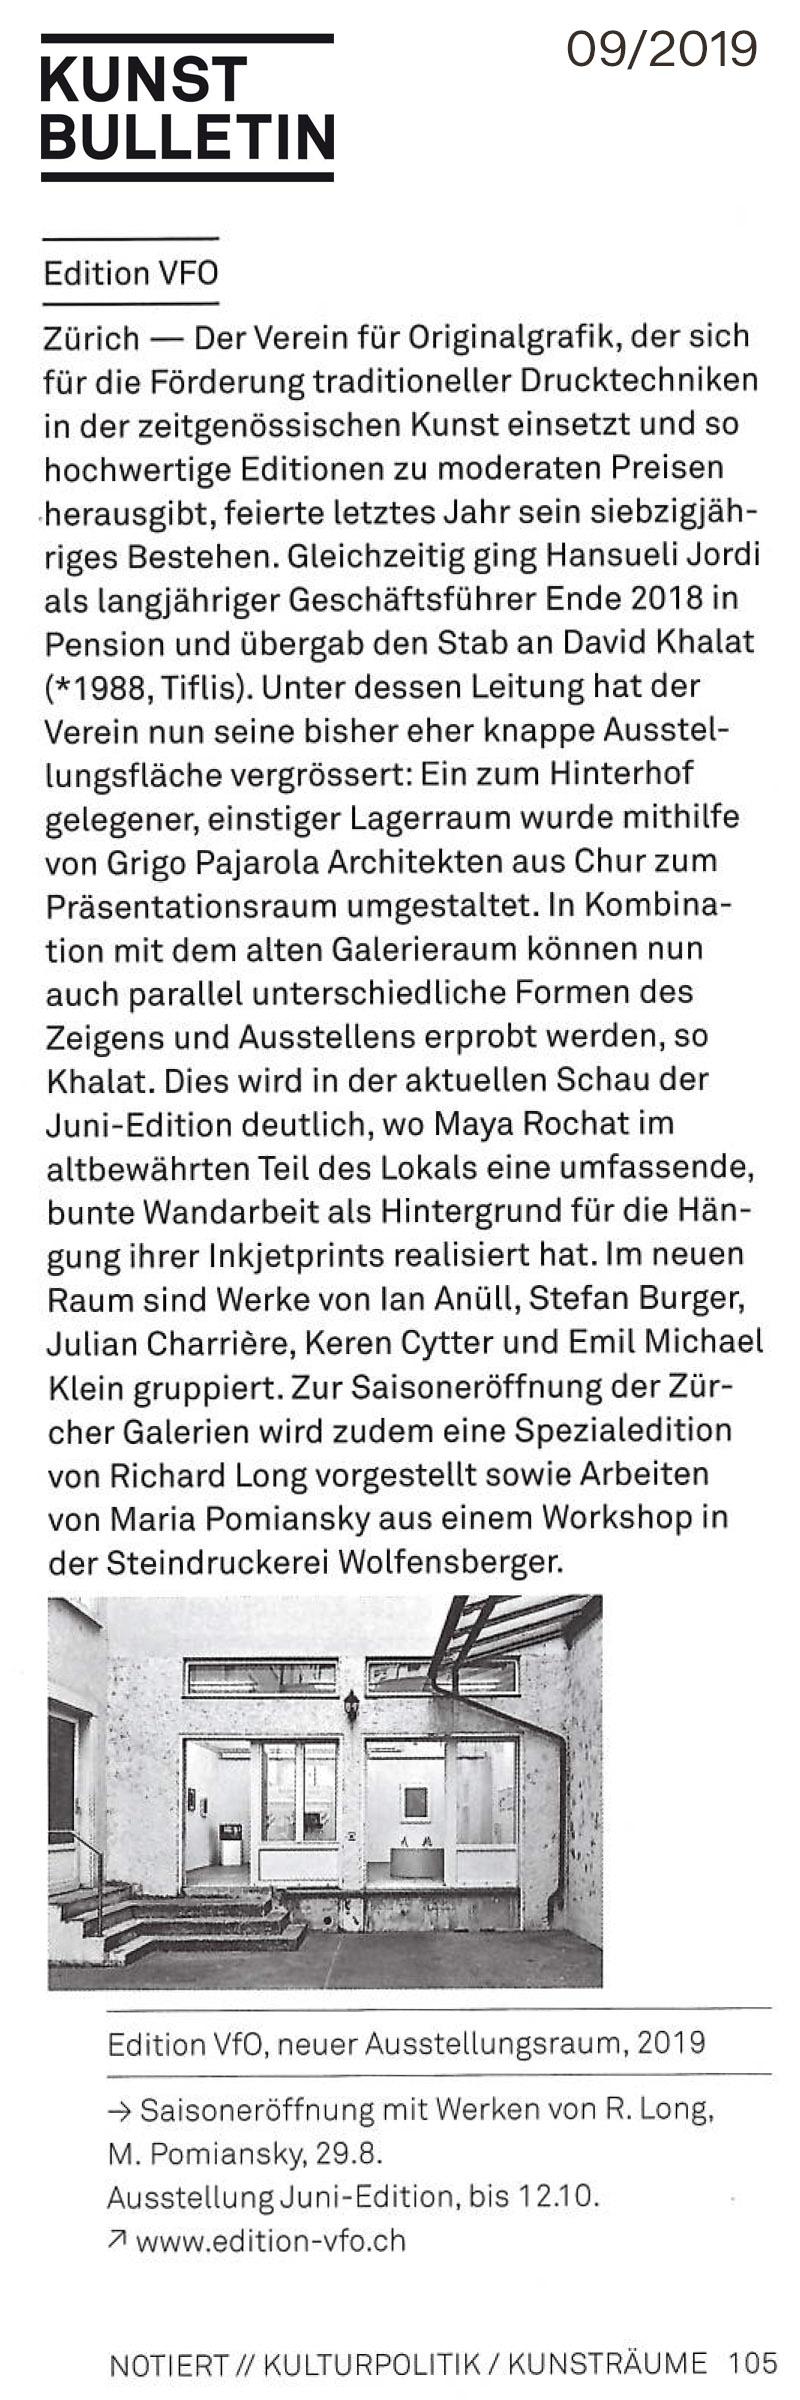 Kunstbulletin 09/2019